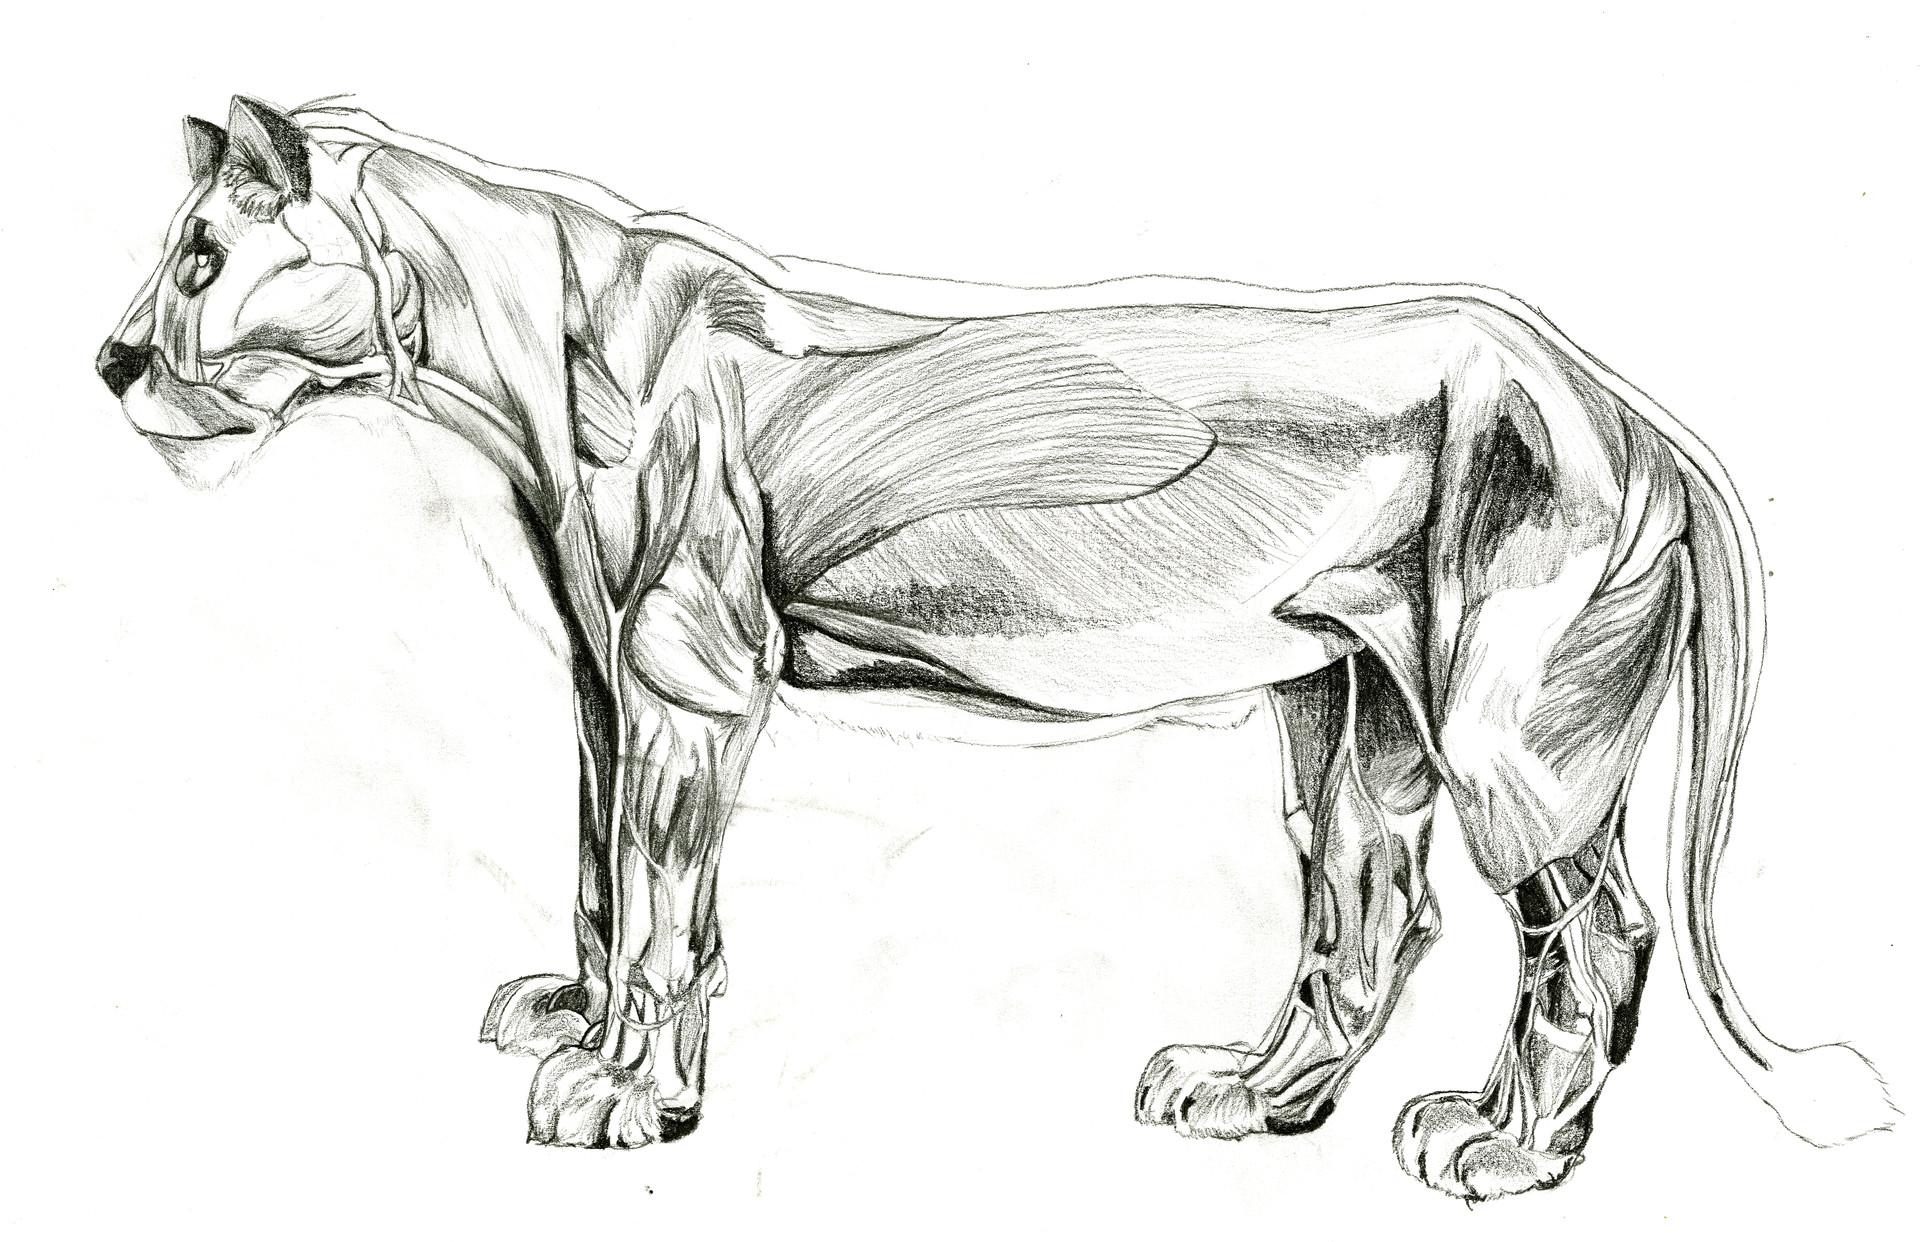 Grem Magic - Animal Anatomy